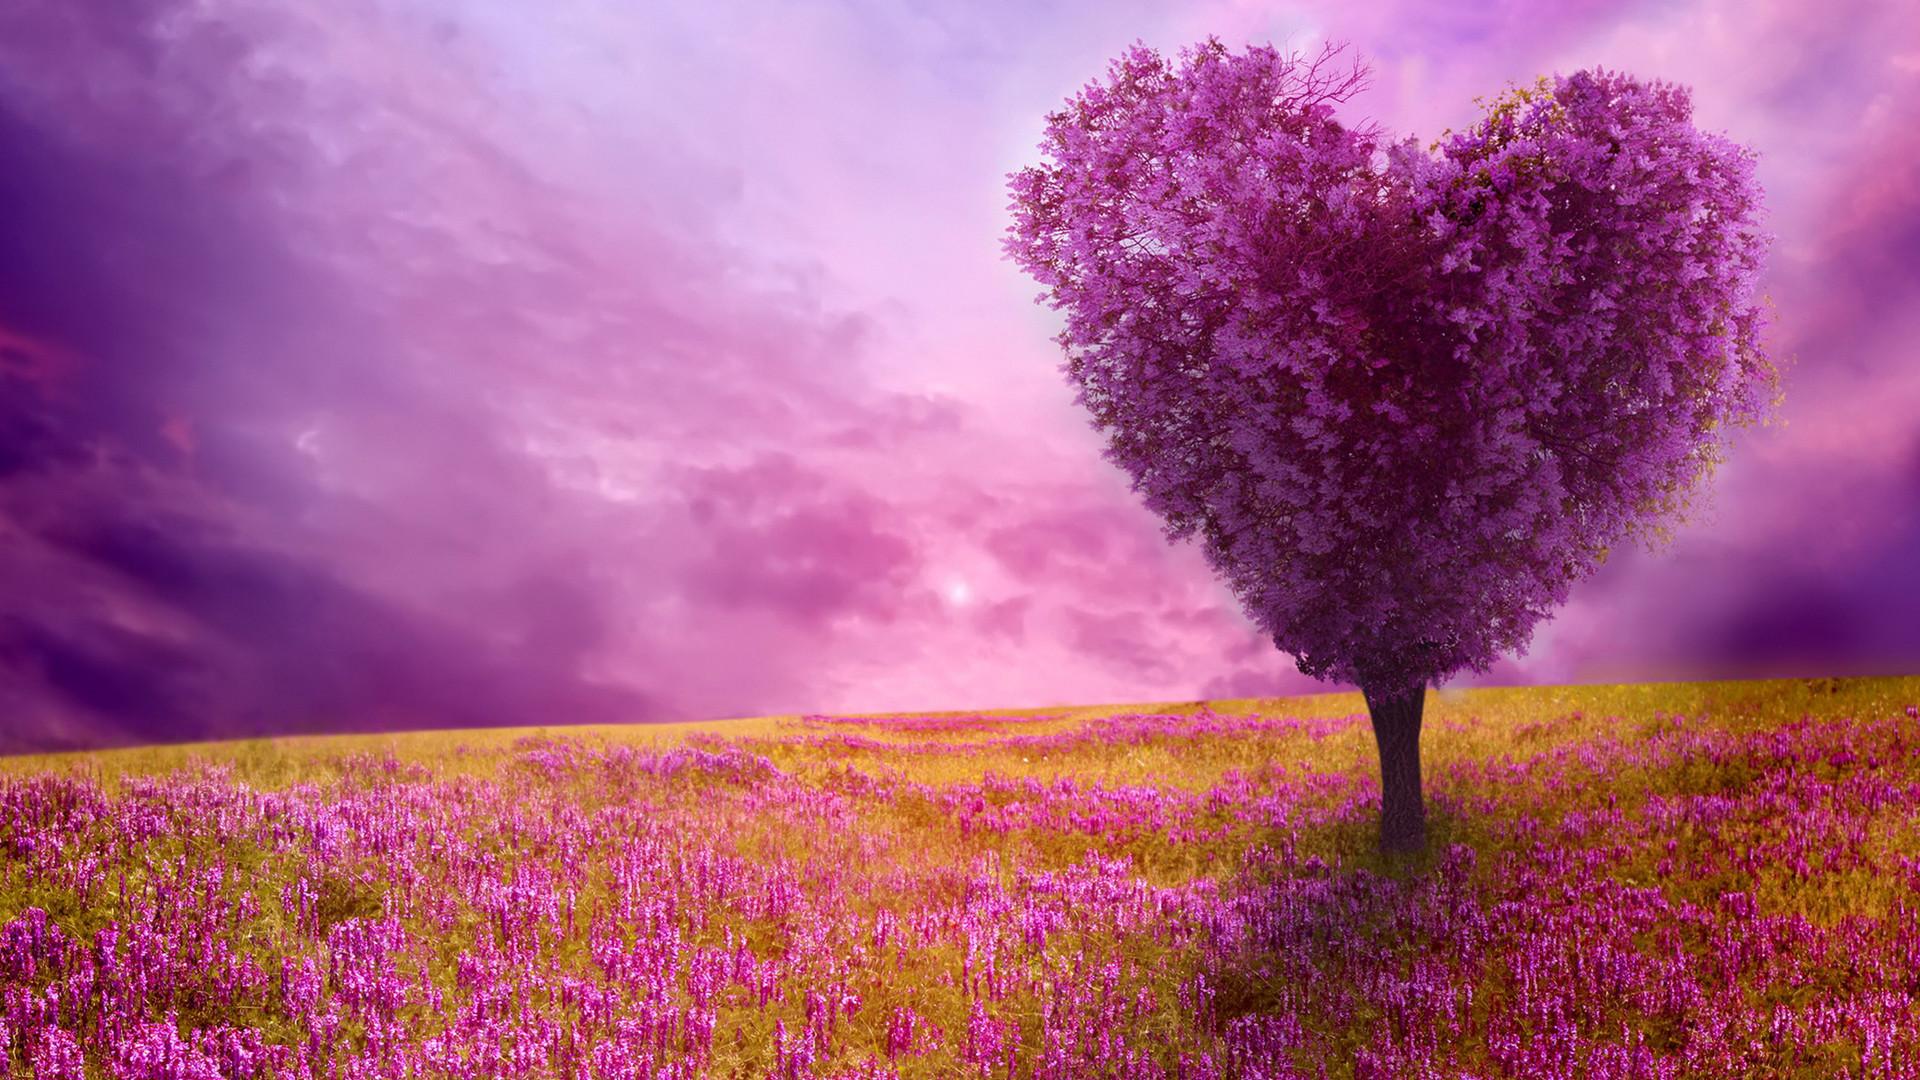 Spring Desktop Backgrounds Gallery 1 Natures Desktop